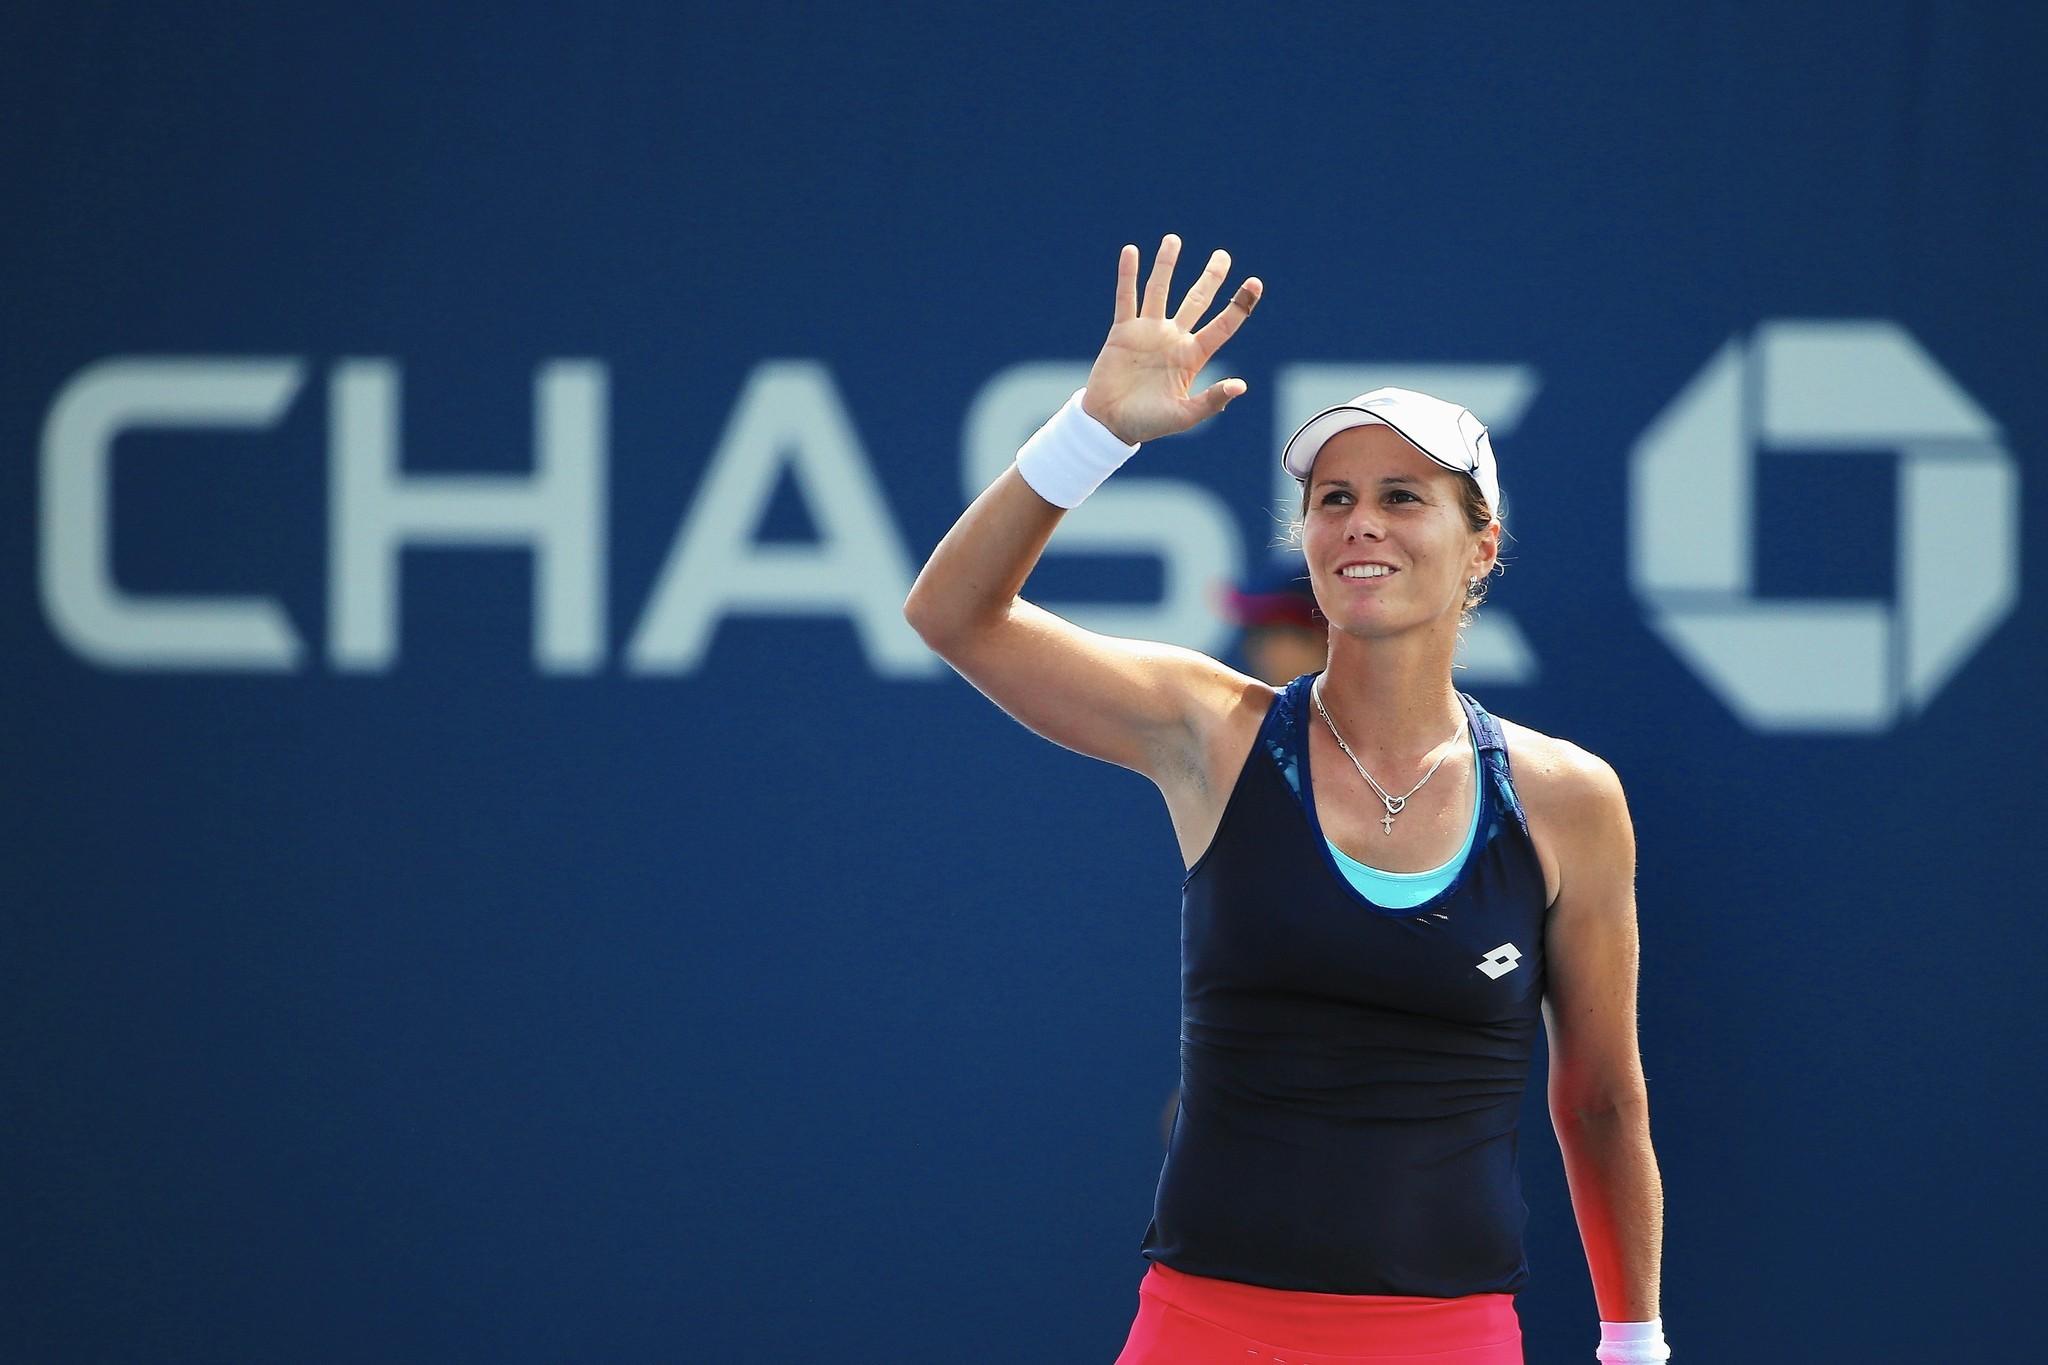 Varvara Lepchenko advances in U.S. Open tennis - The ...Varvara Lepchenko Matches